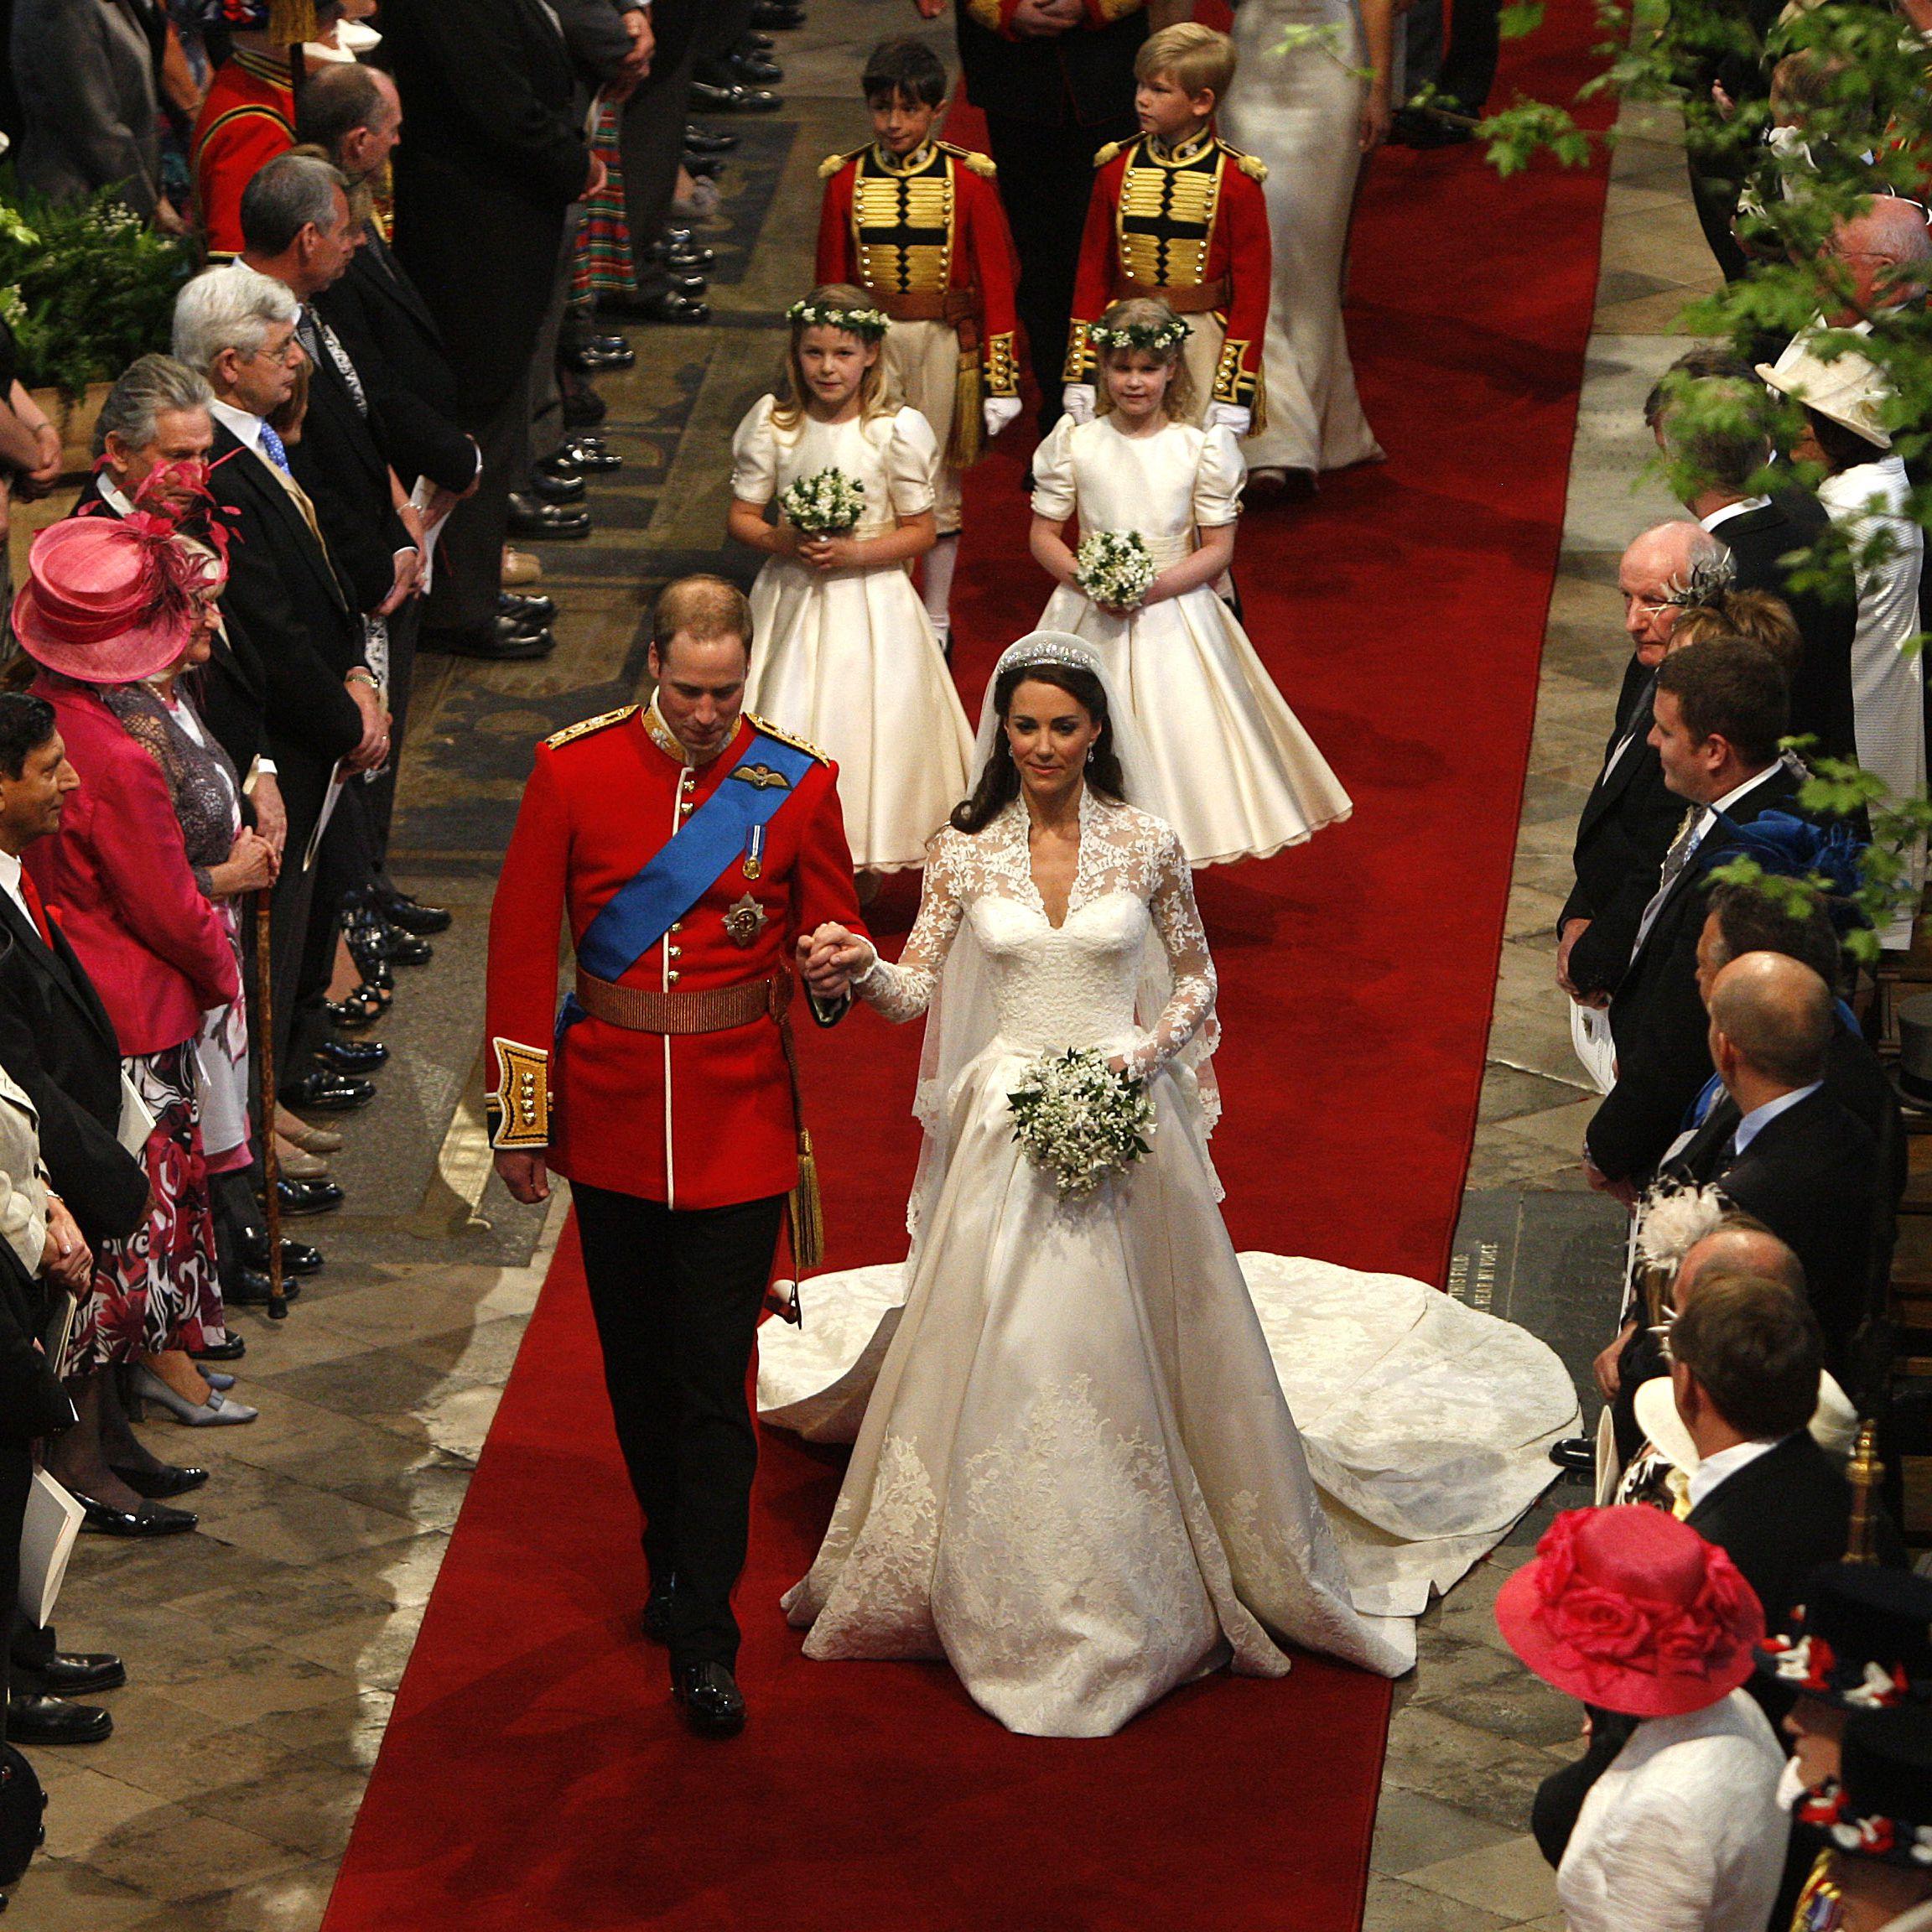 Prince William and Catherine's Royal Wedding Music